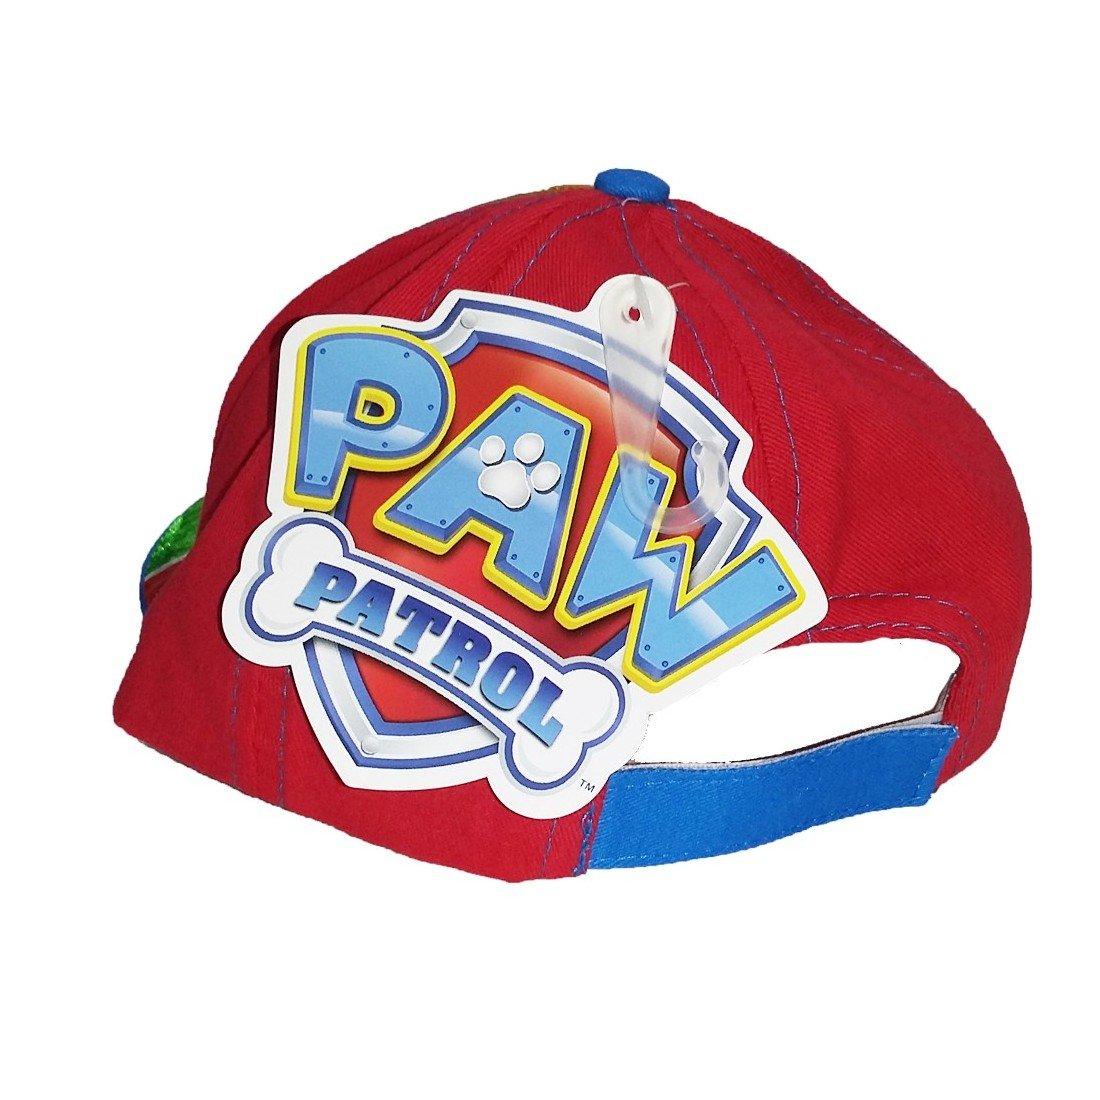 Paw Patrol Premium Cappello con Visiera Bambini Baseball tg 50,52